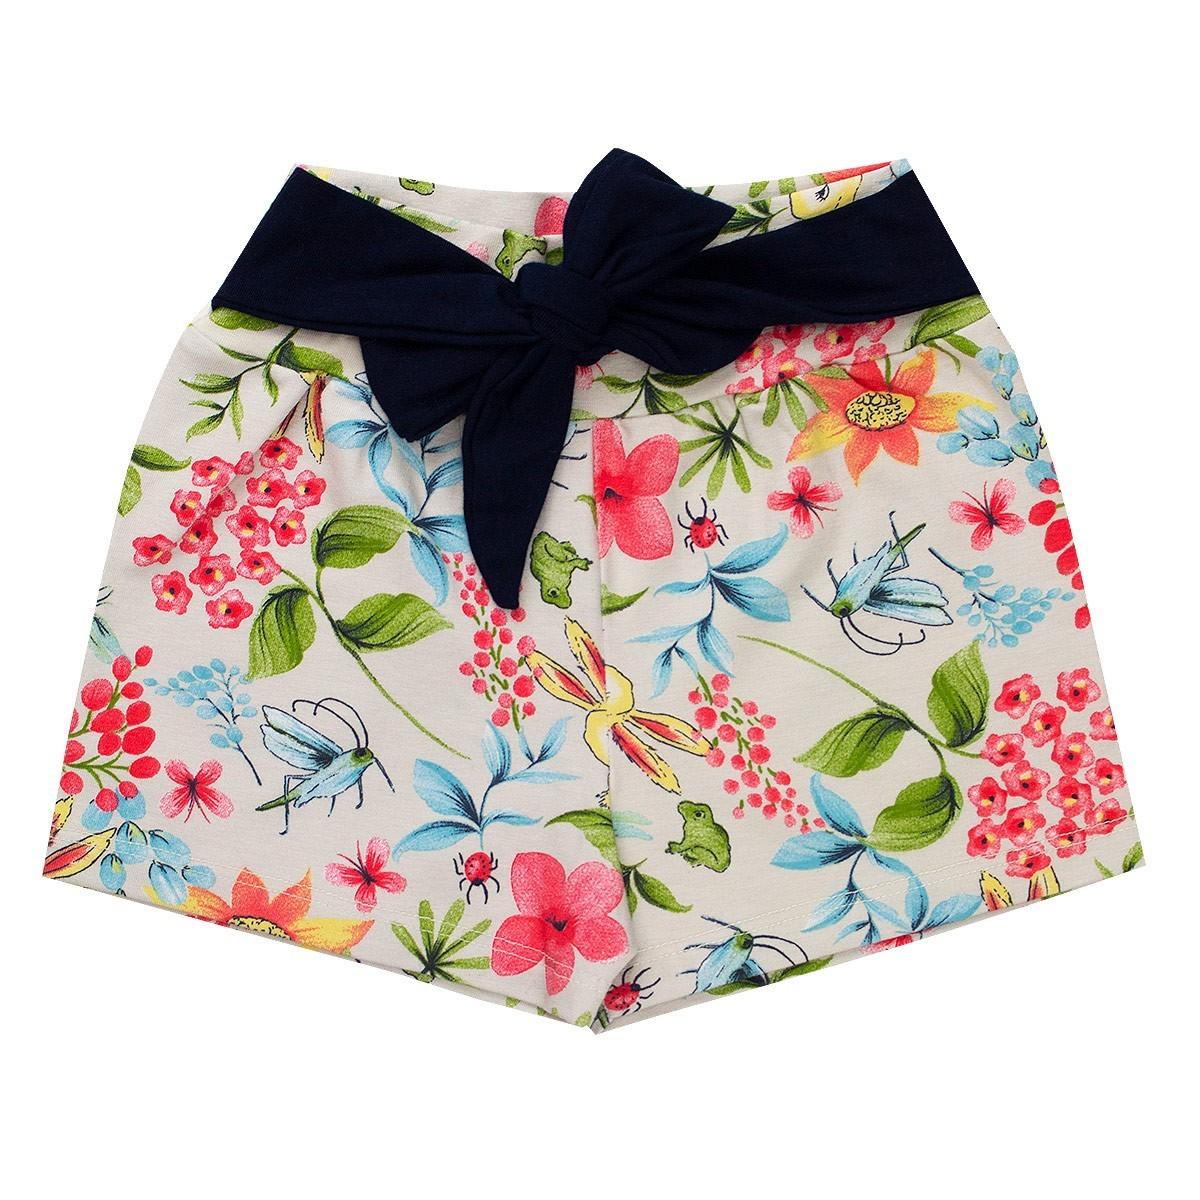 Shorts Infantil Menina Cotton Com Lacinho Pérola  Fantoni